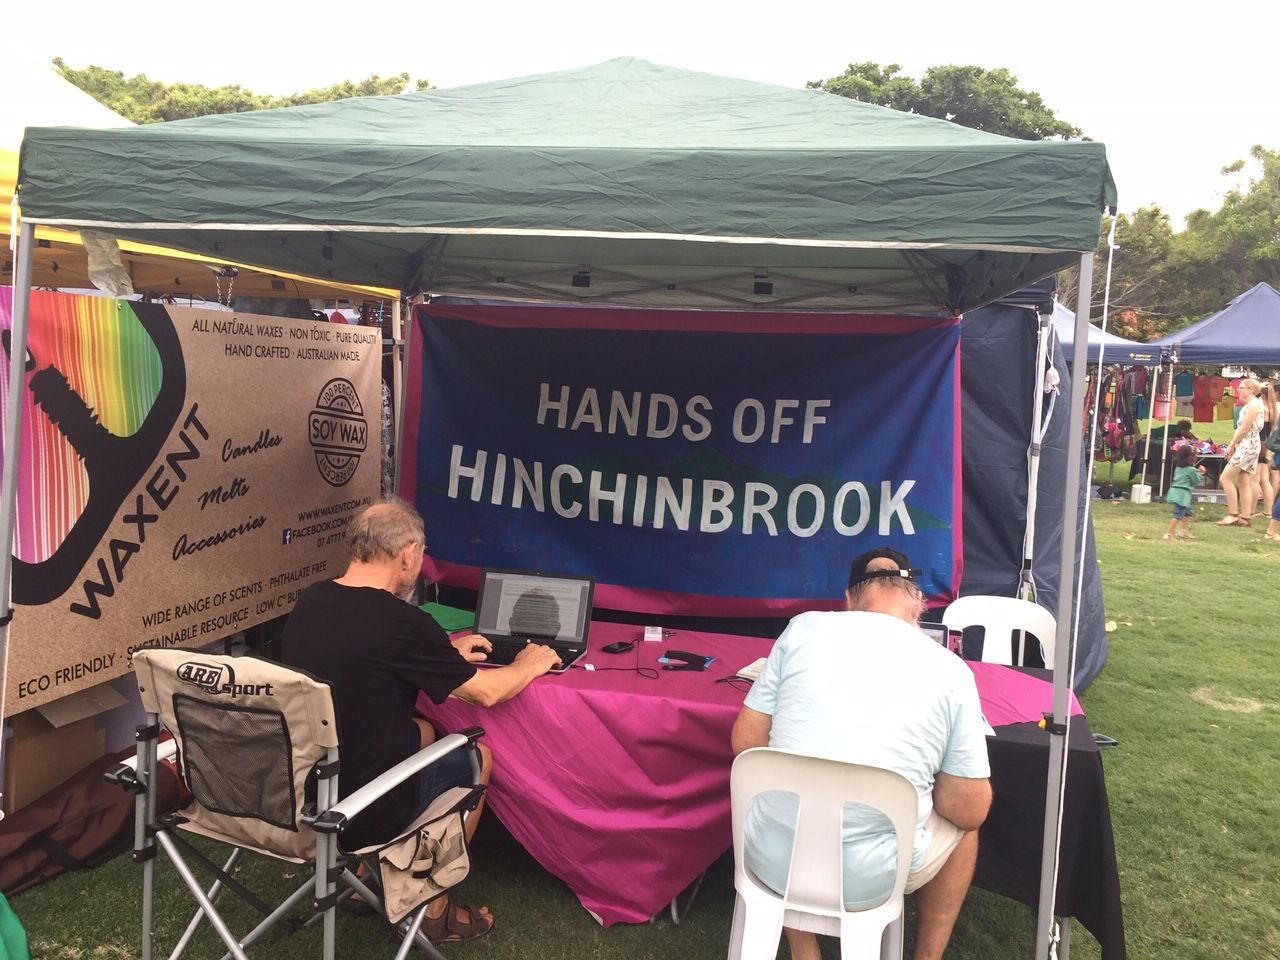 Hinchinbrook_stall.JPG